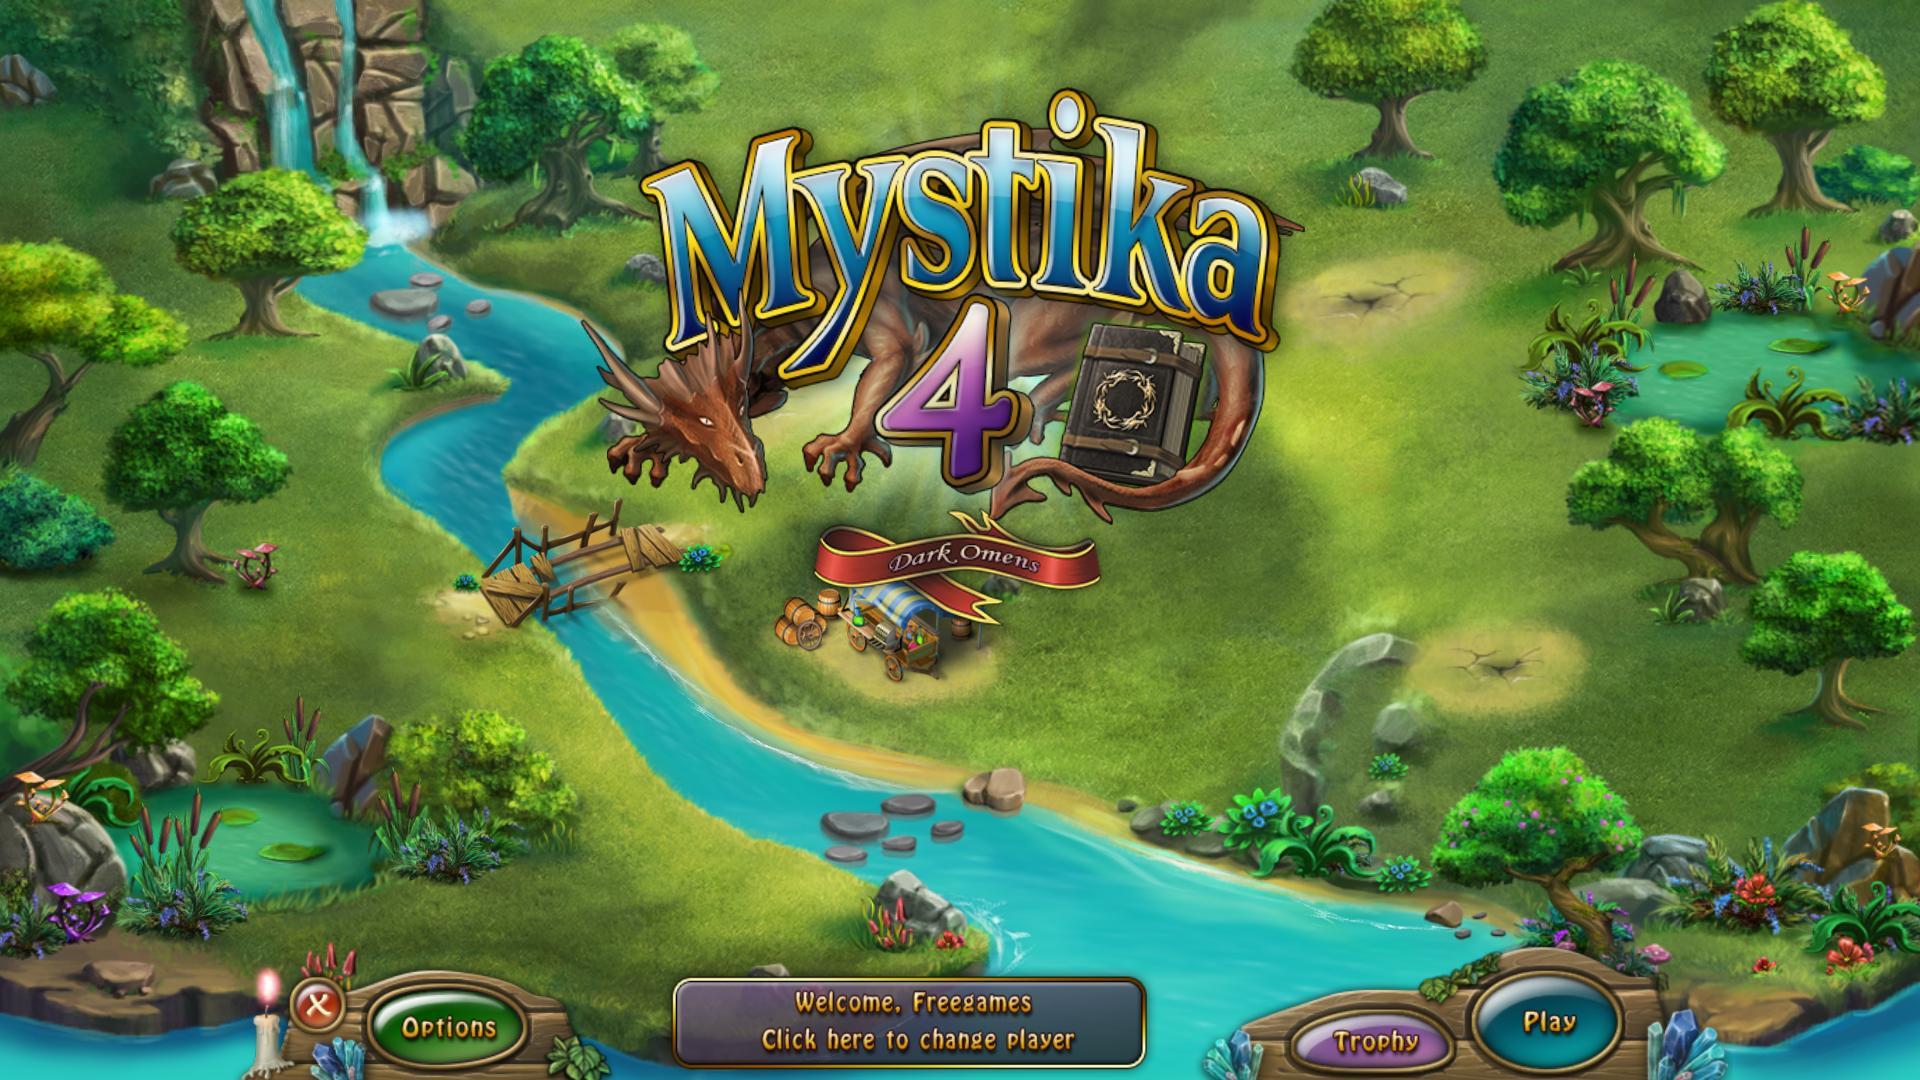 Мистика 4: Темные предзнаменования | Mystika 4: Dark Omens (En)